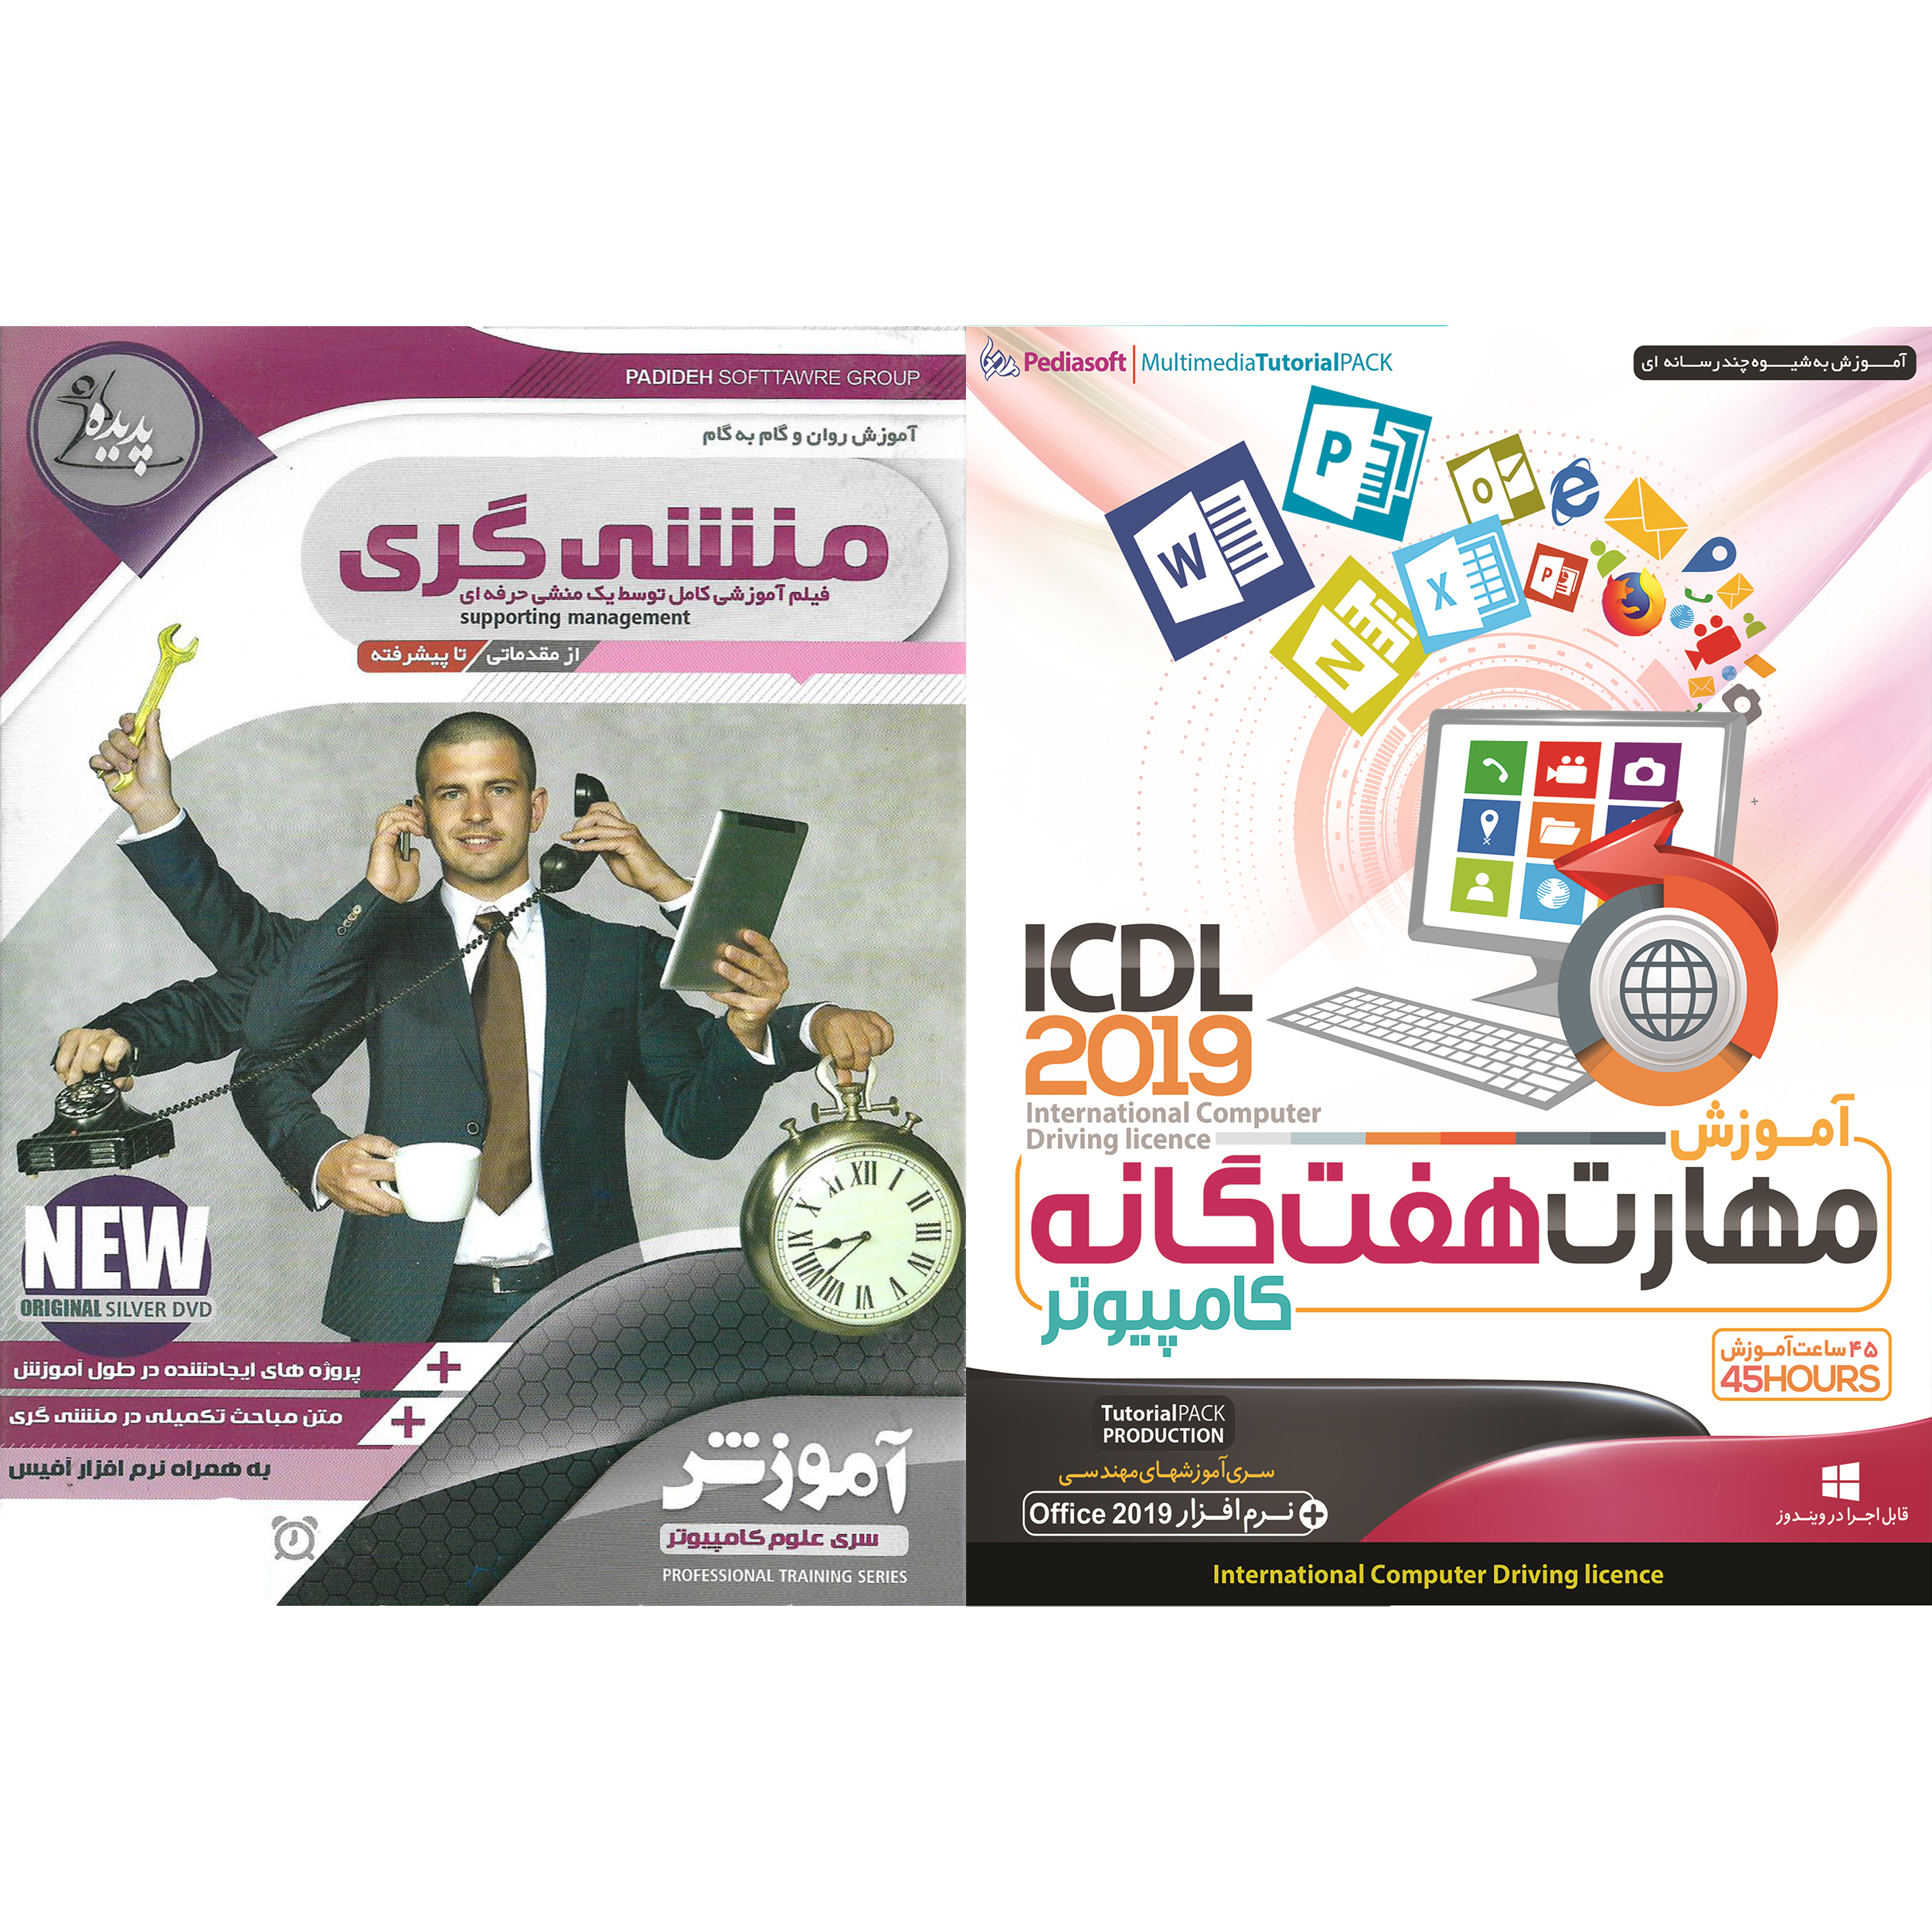 نرم افزار آموزش مهارت هفتگانه کامپیوتر ICDL 2019 نشر پدیا سافت به همراه نرم افزار آموزش منشی گری نشر پدیده